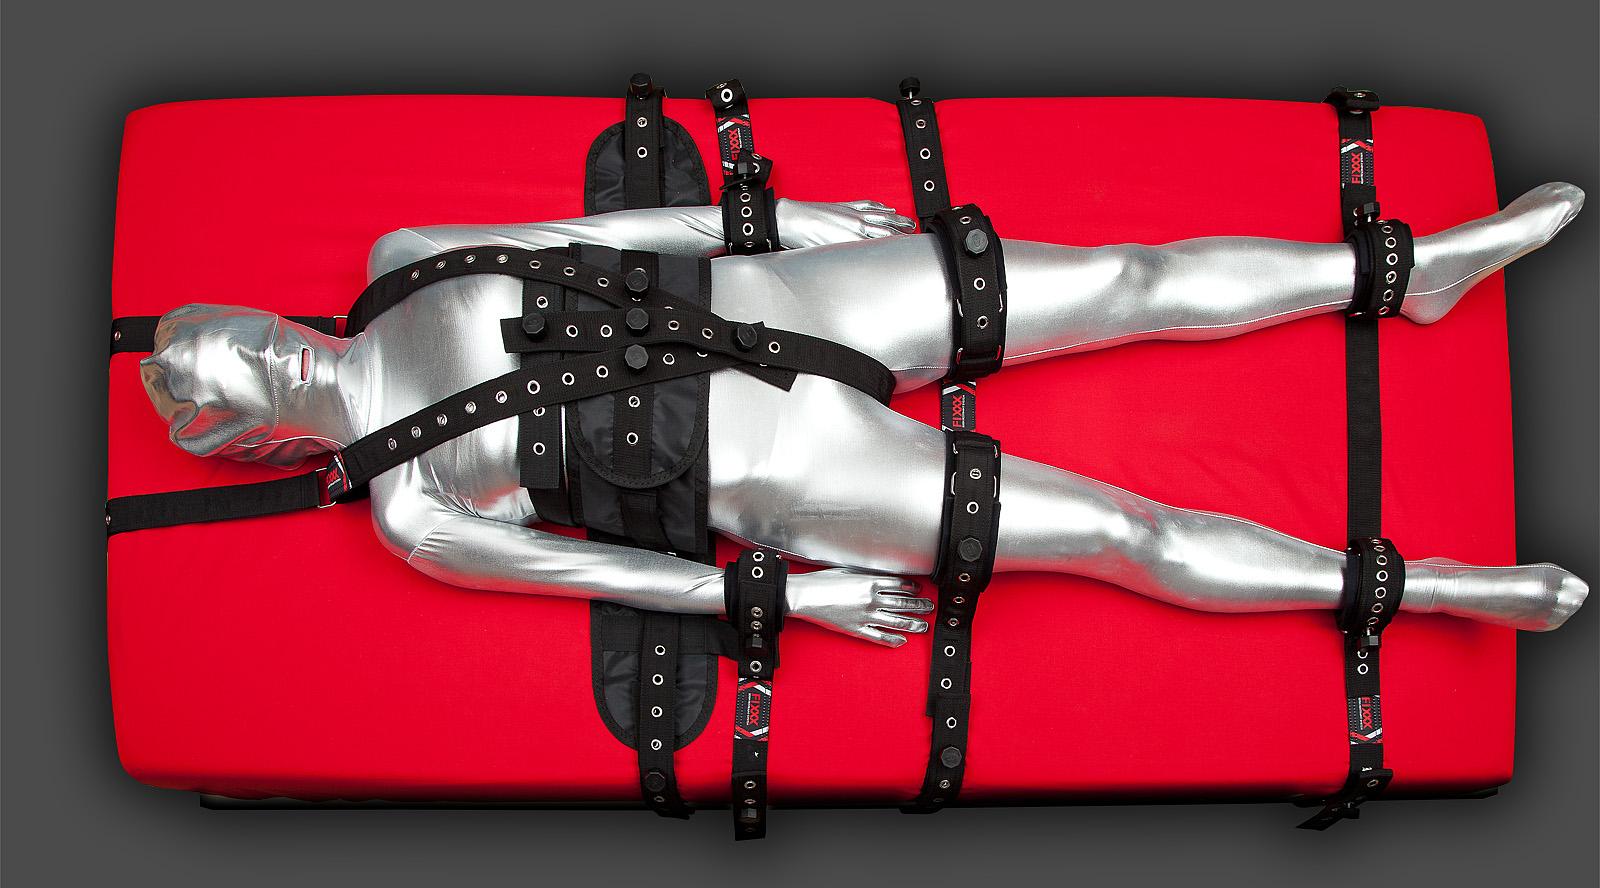 Full Body Bondage Systems